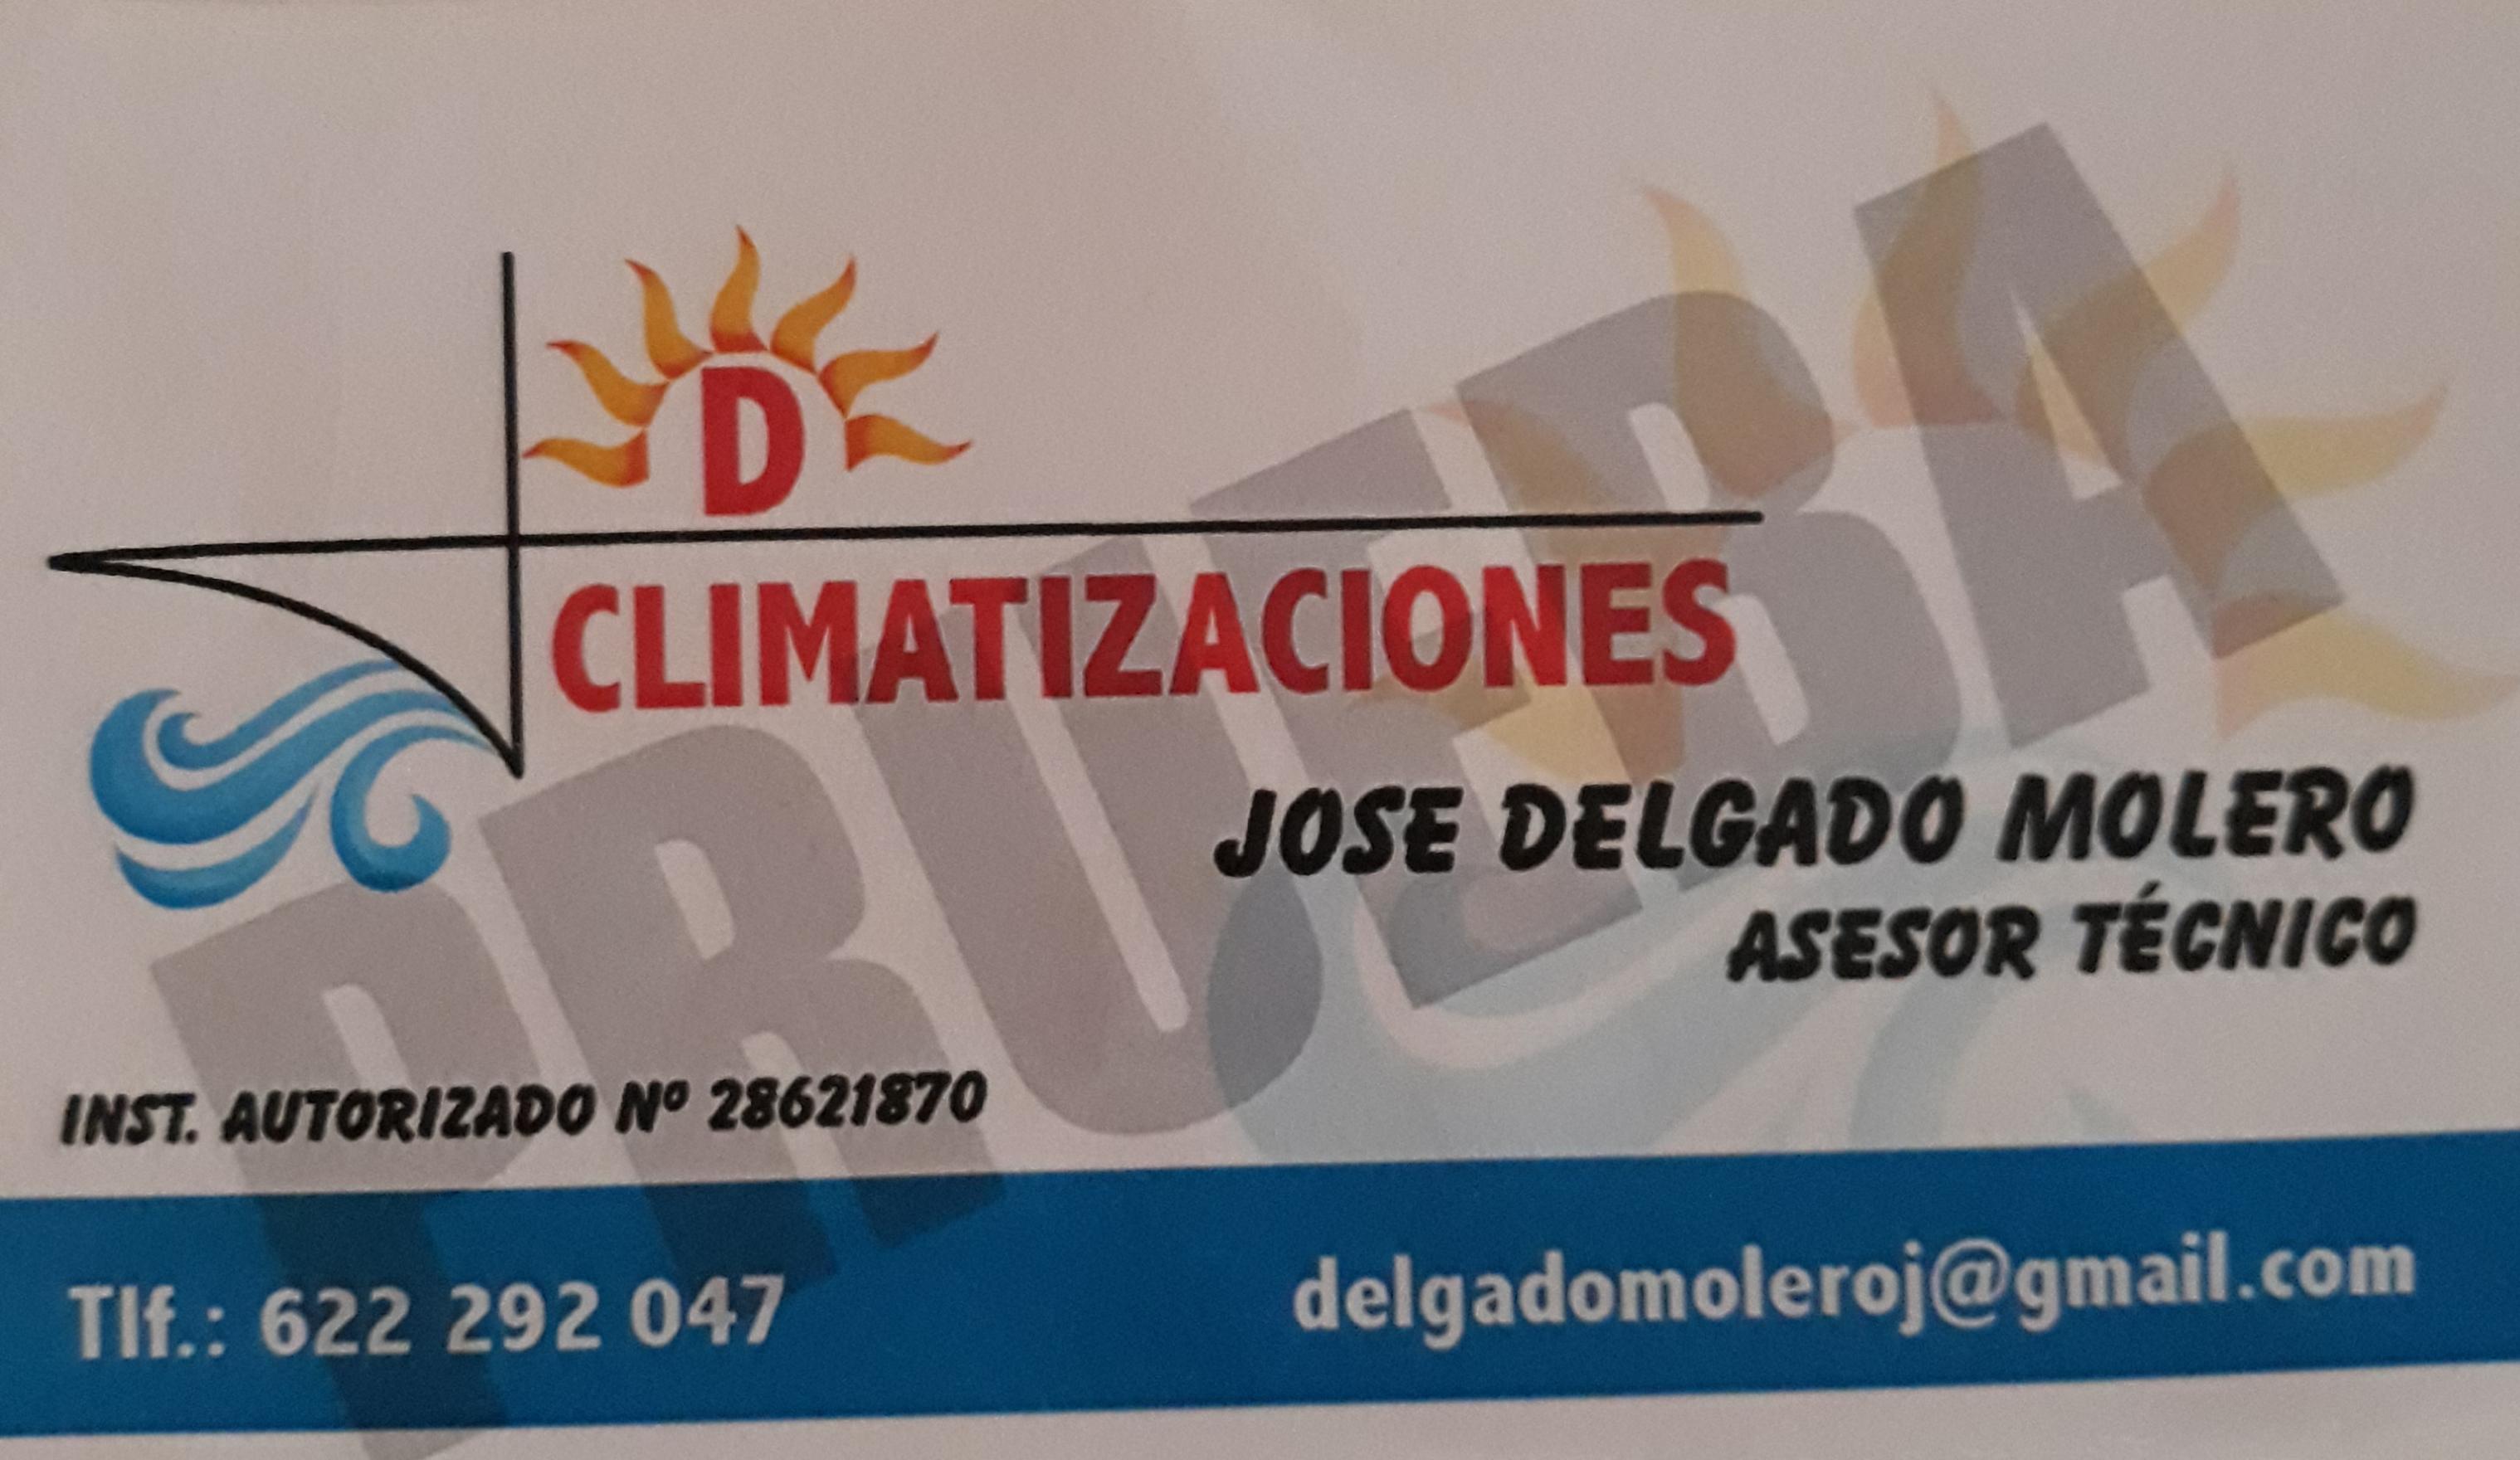 climatizacionesjd